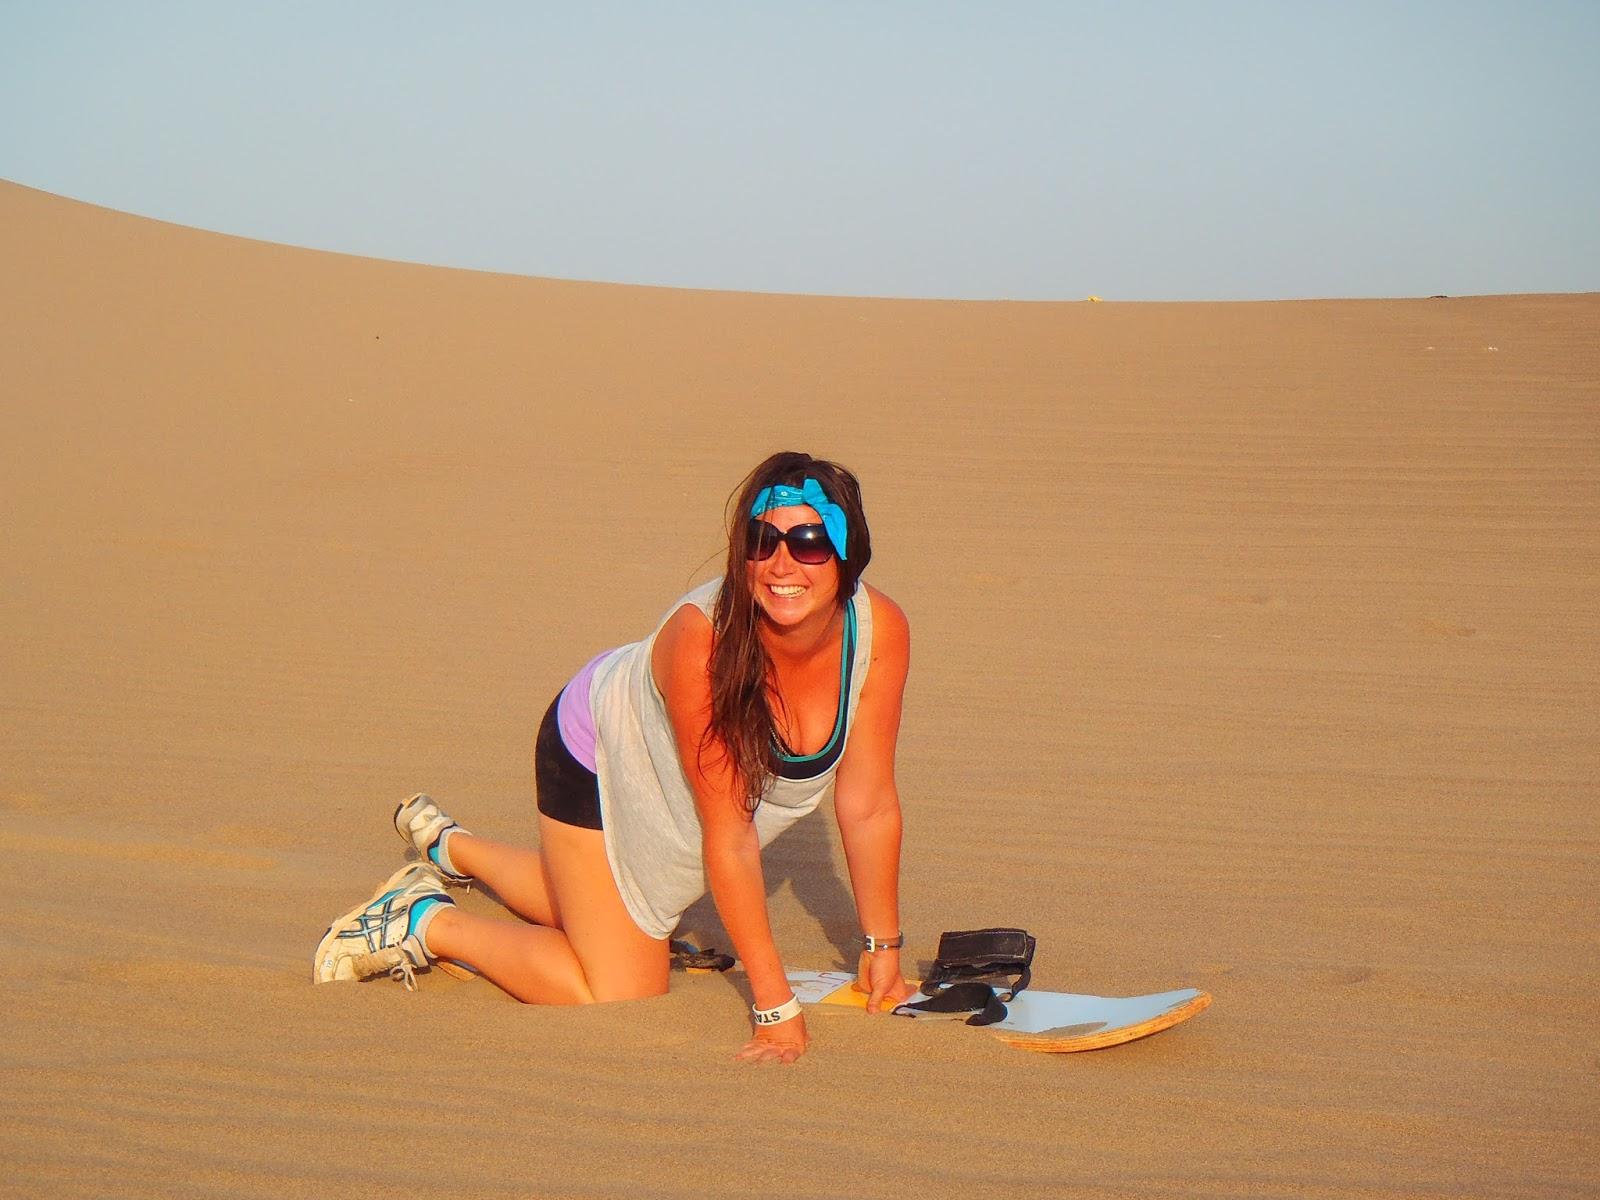 Simone sandboarding Peru